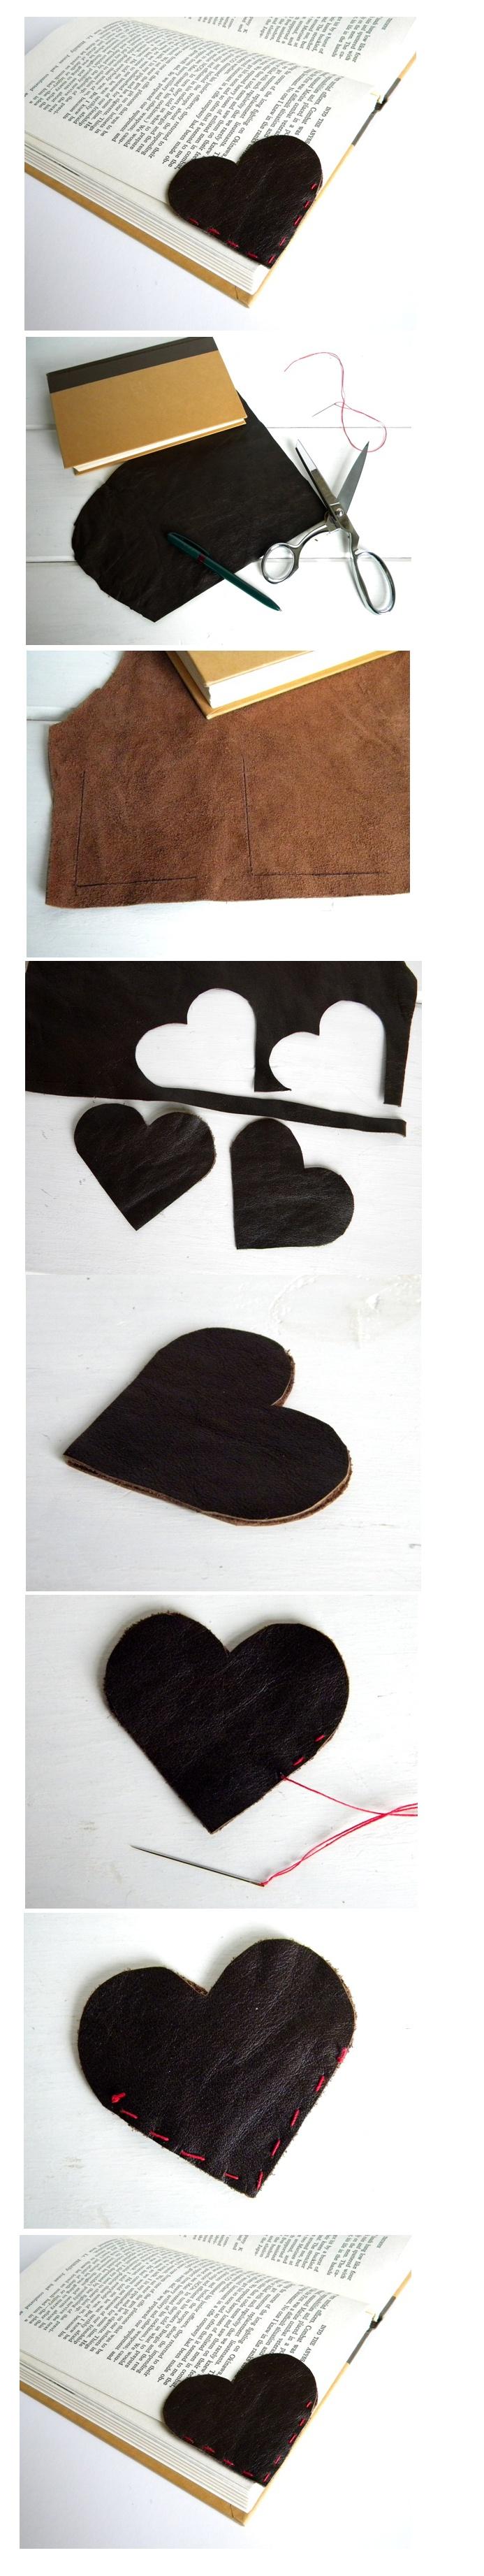 Leather Heart Bookmark DIY  http://belrossa.blogspot.be